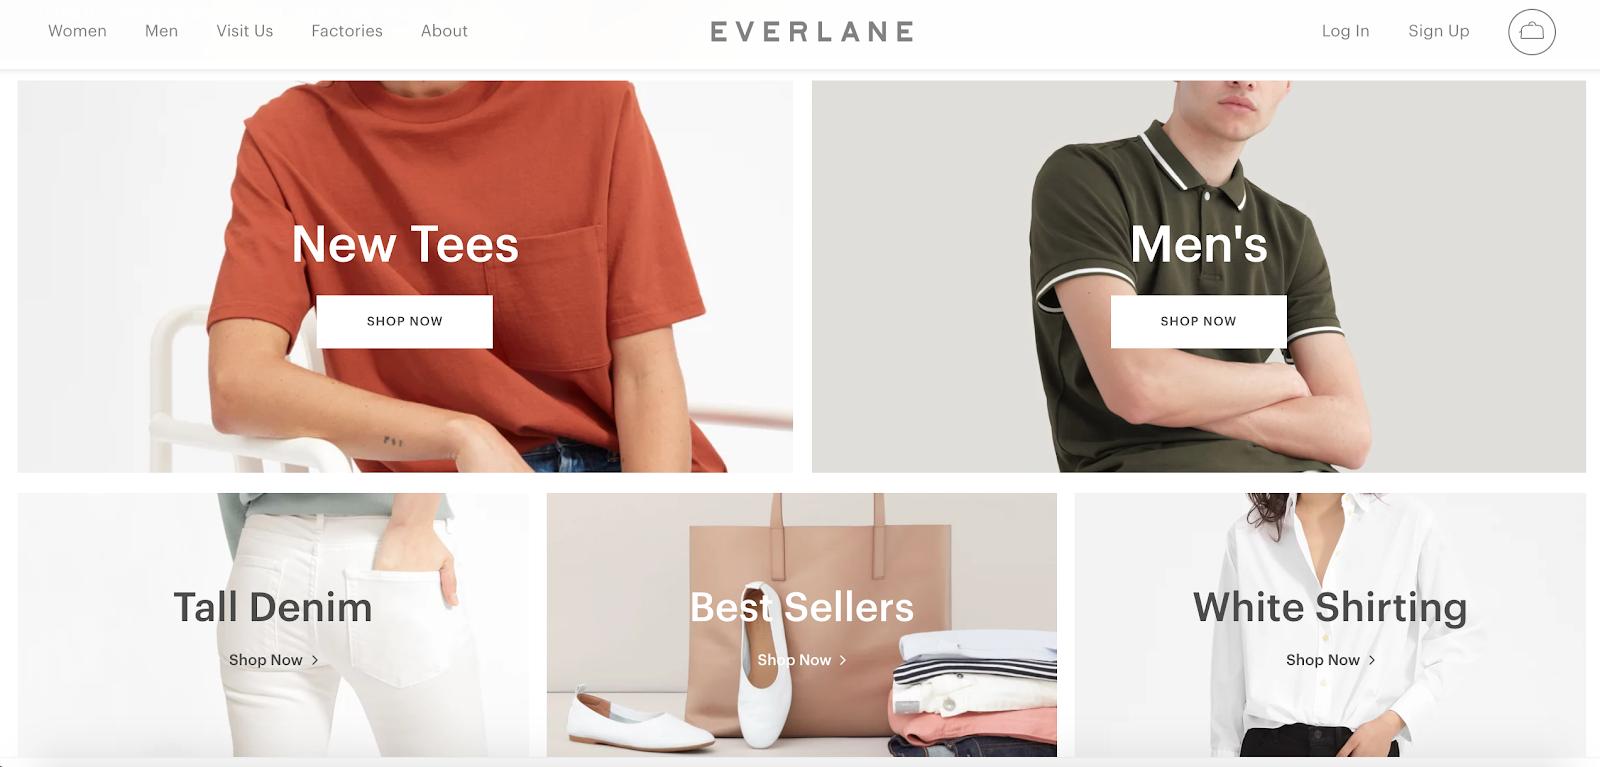 Screenshot showing Everlane